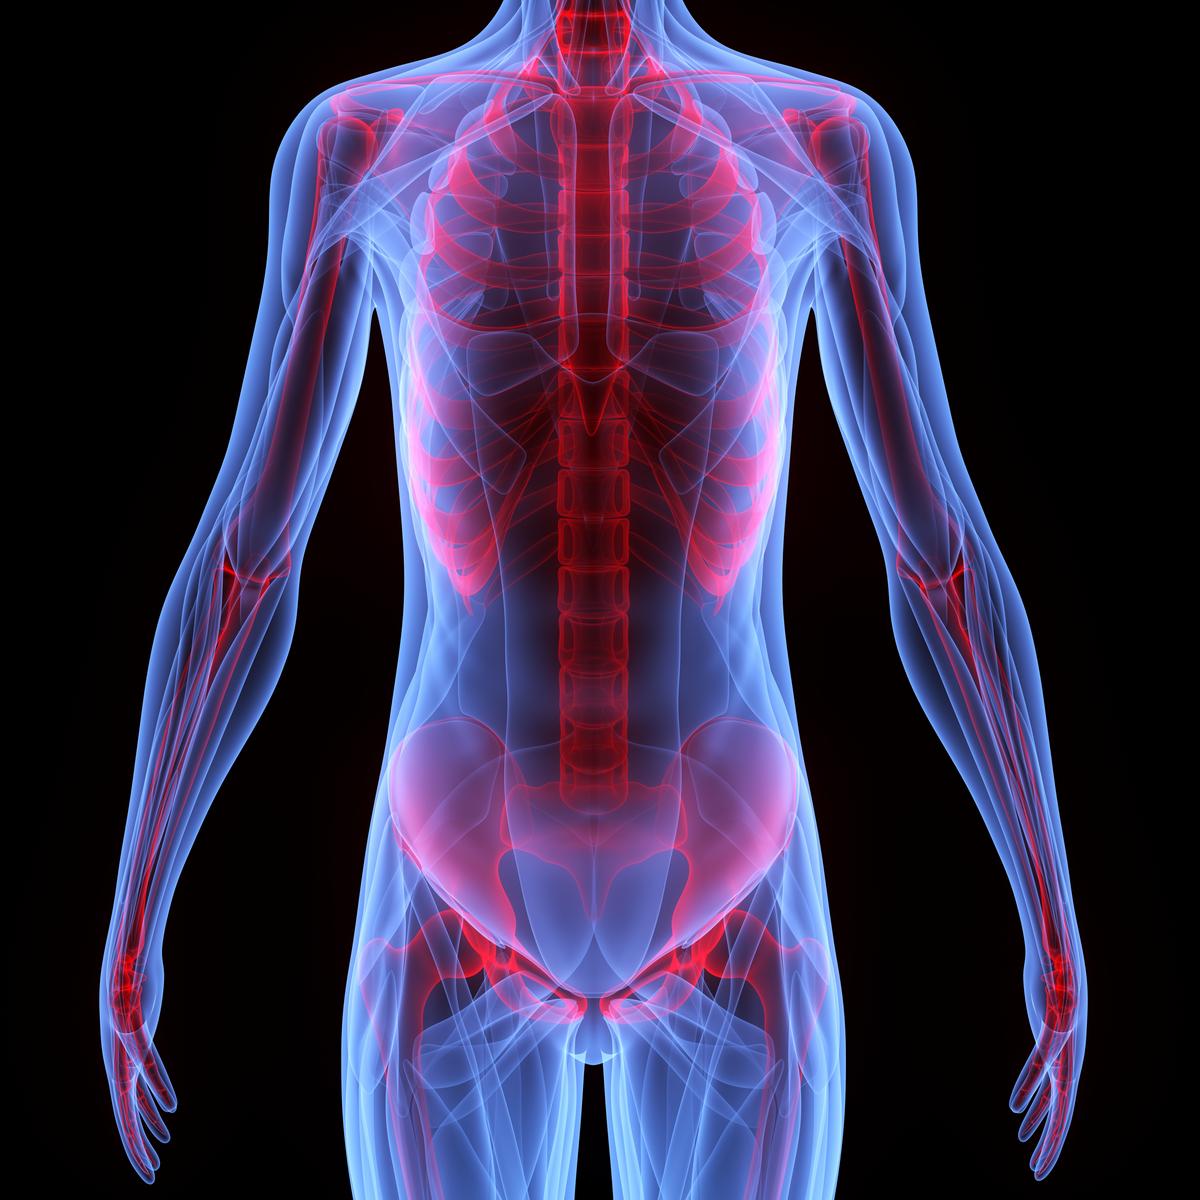 Nerve-pain-body